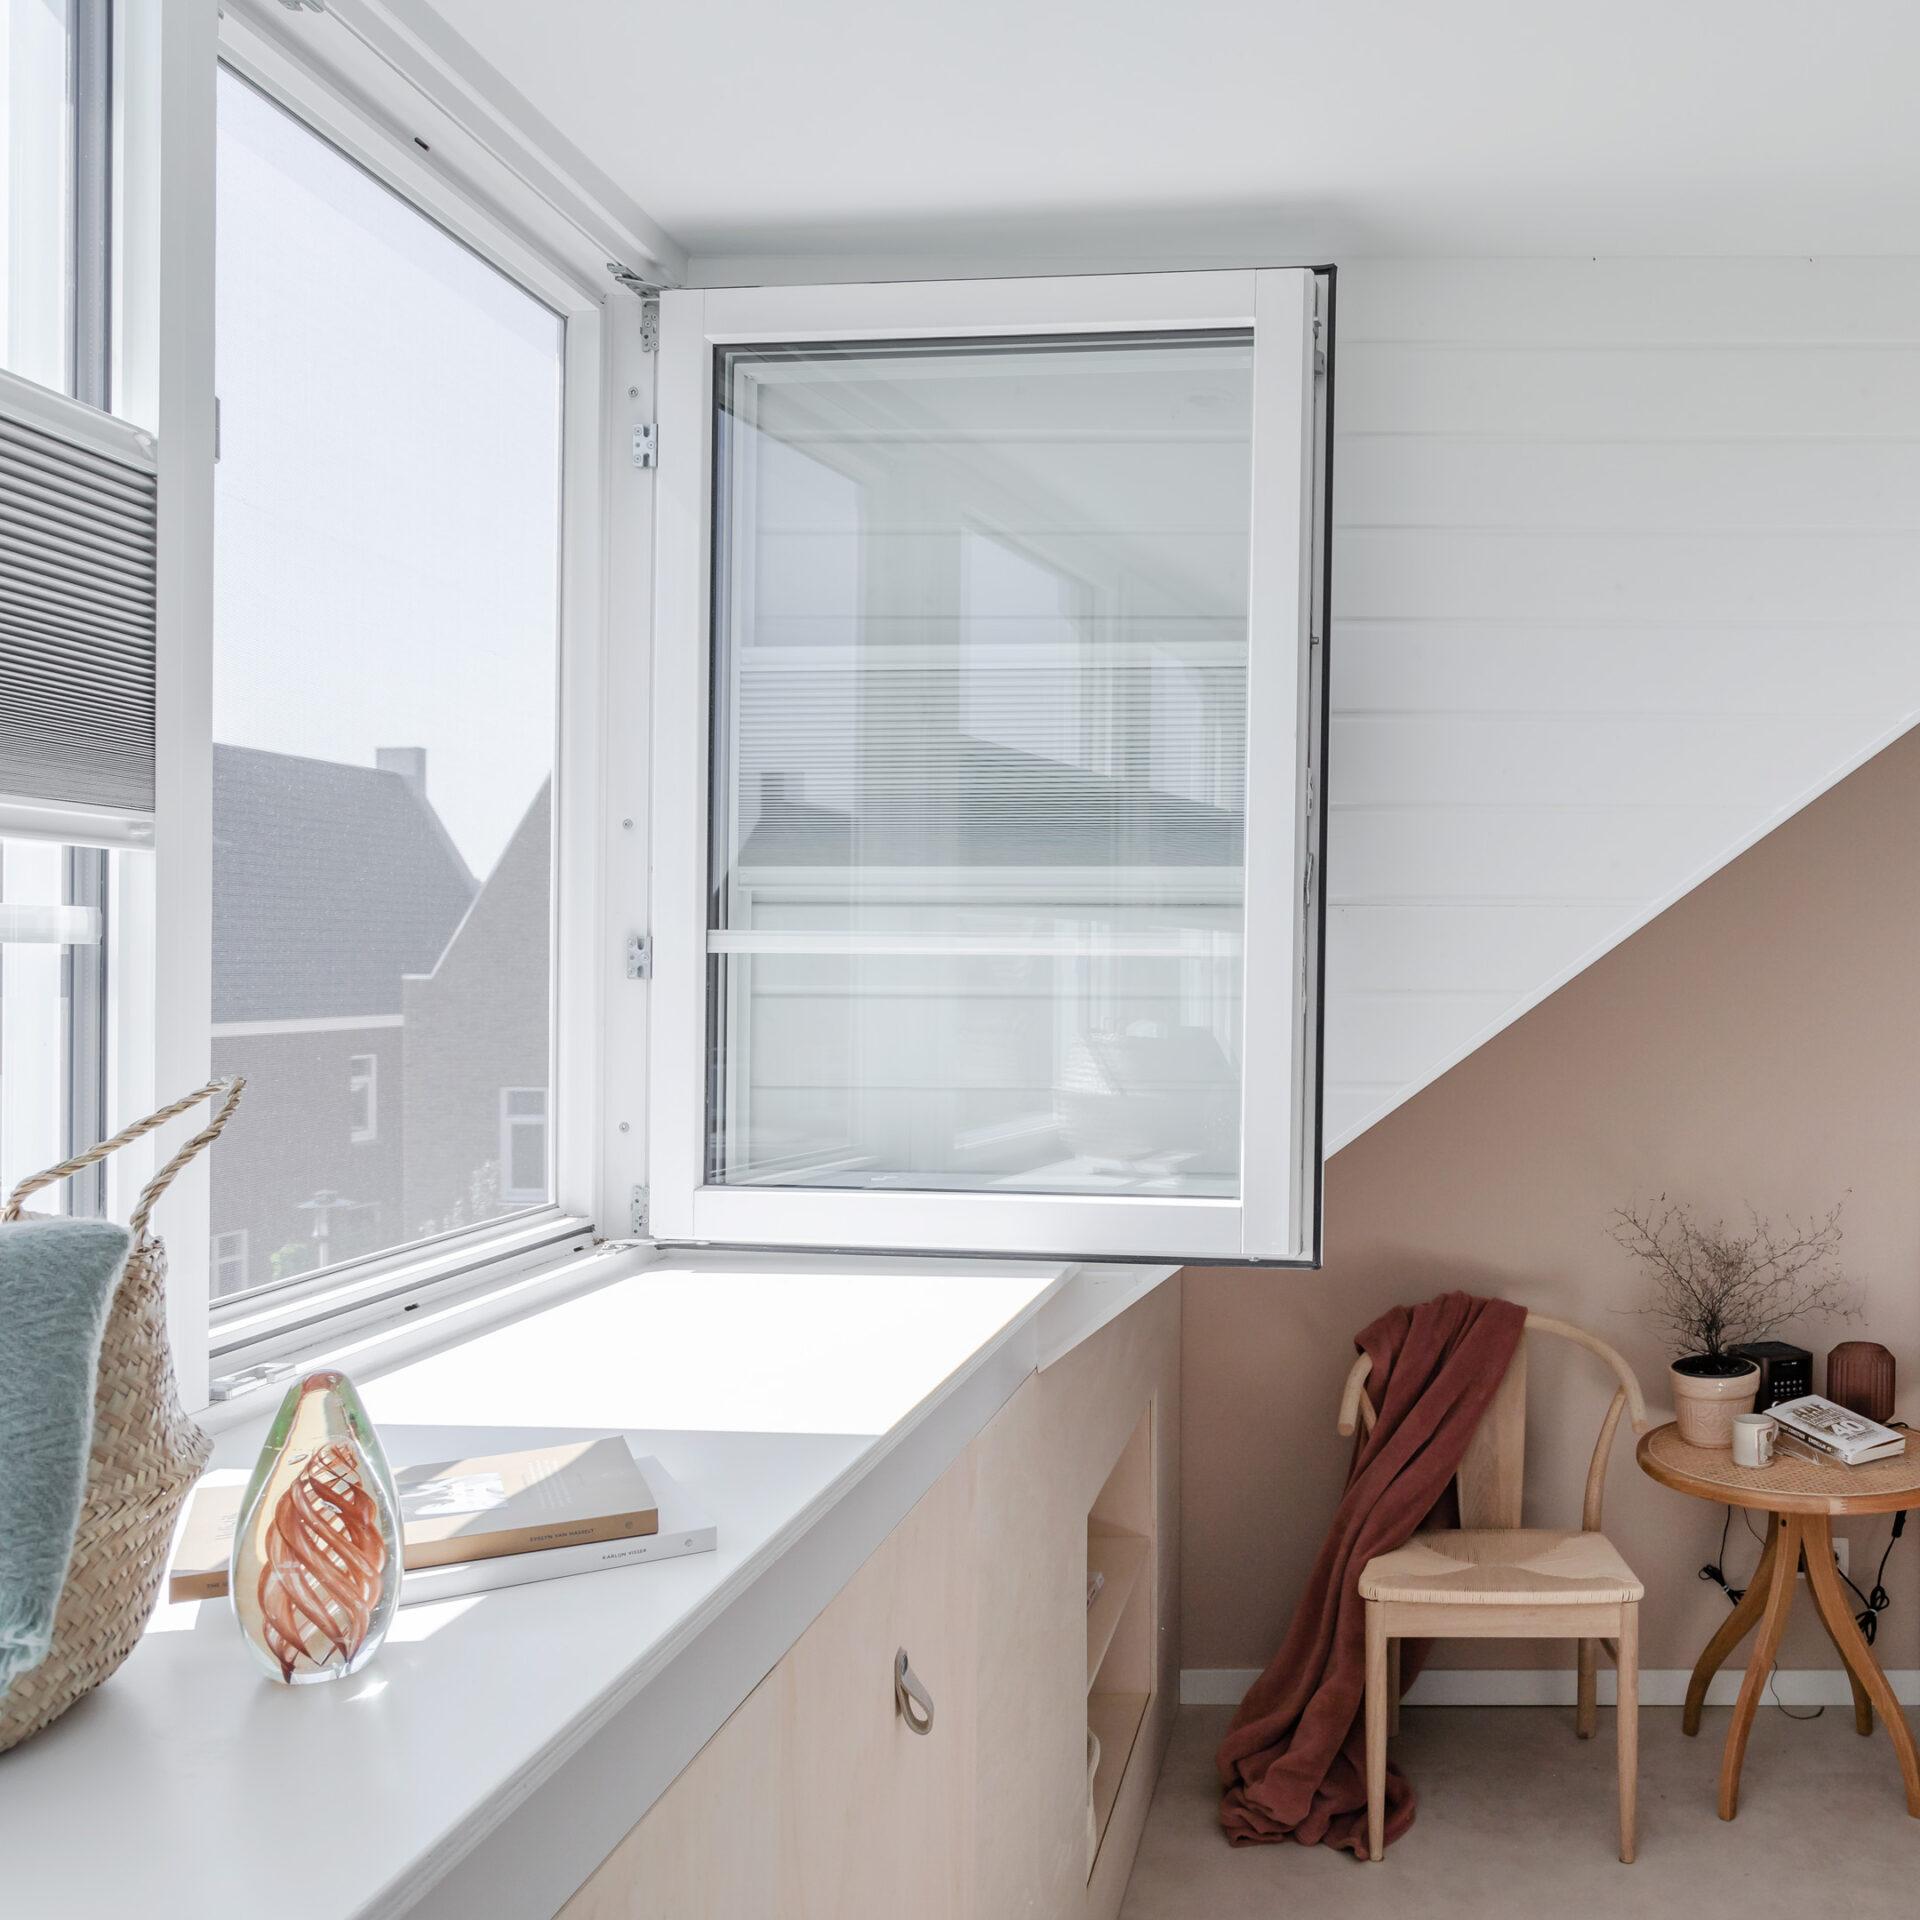 Select Windows Kunststof kozijnen - Onderhoudsarme dakkapel in Haarlemmermeer